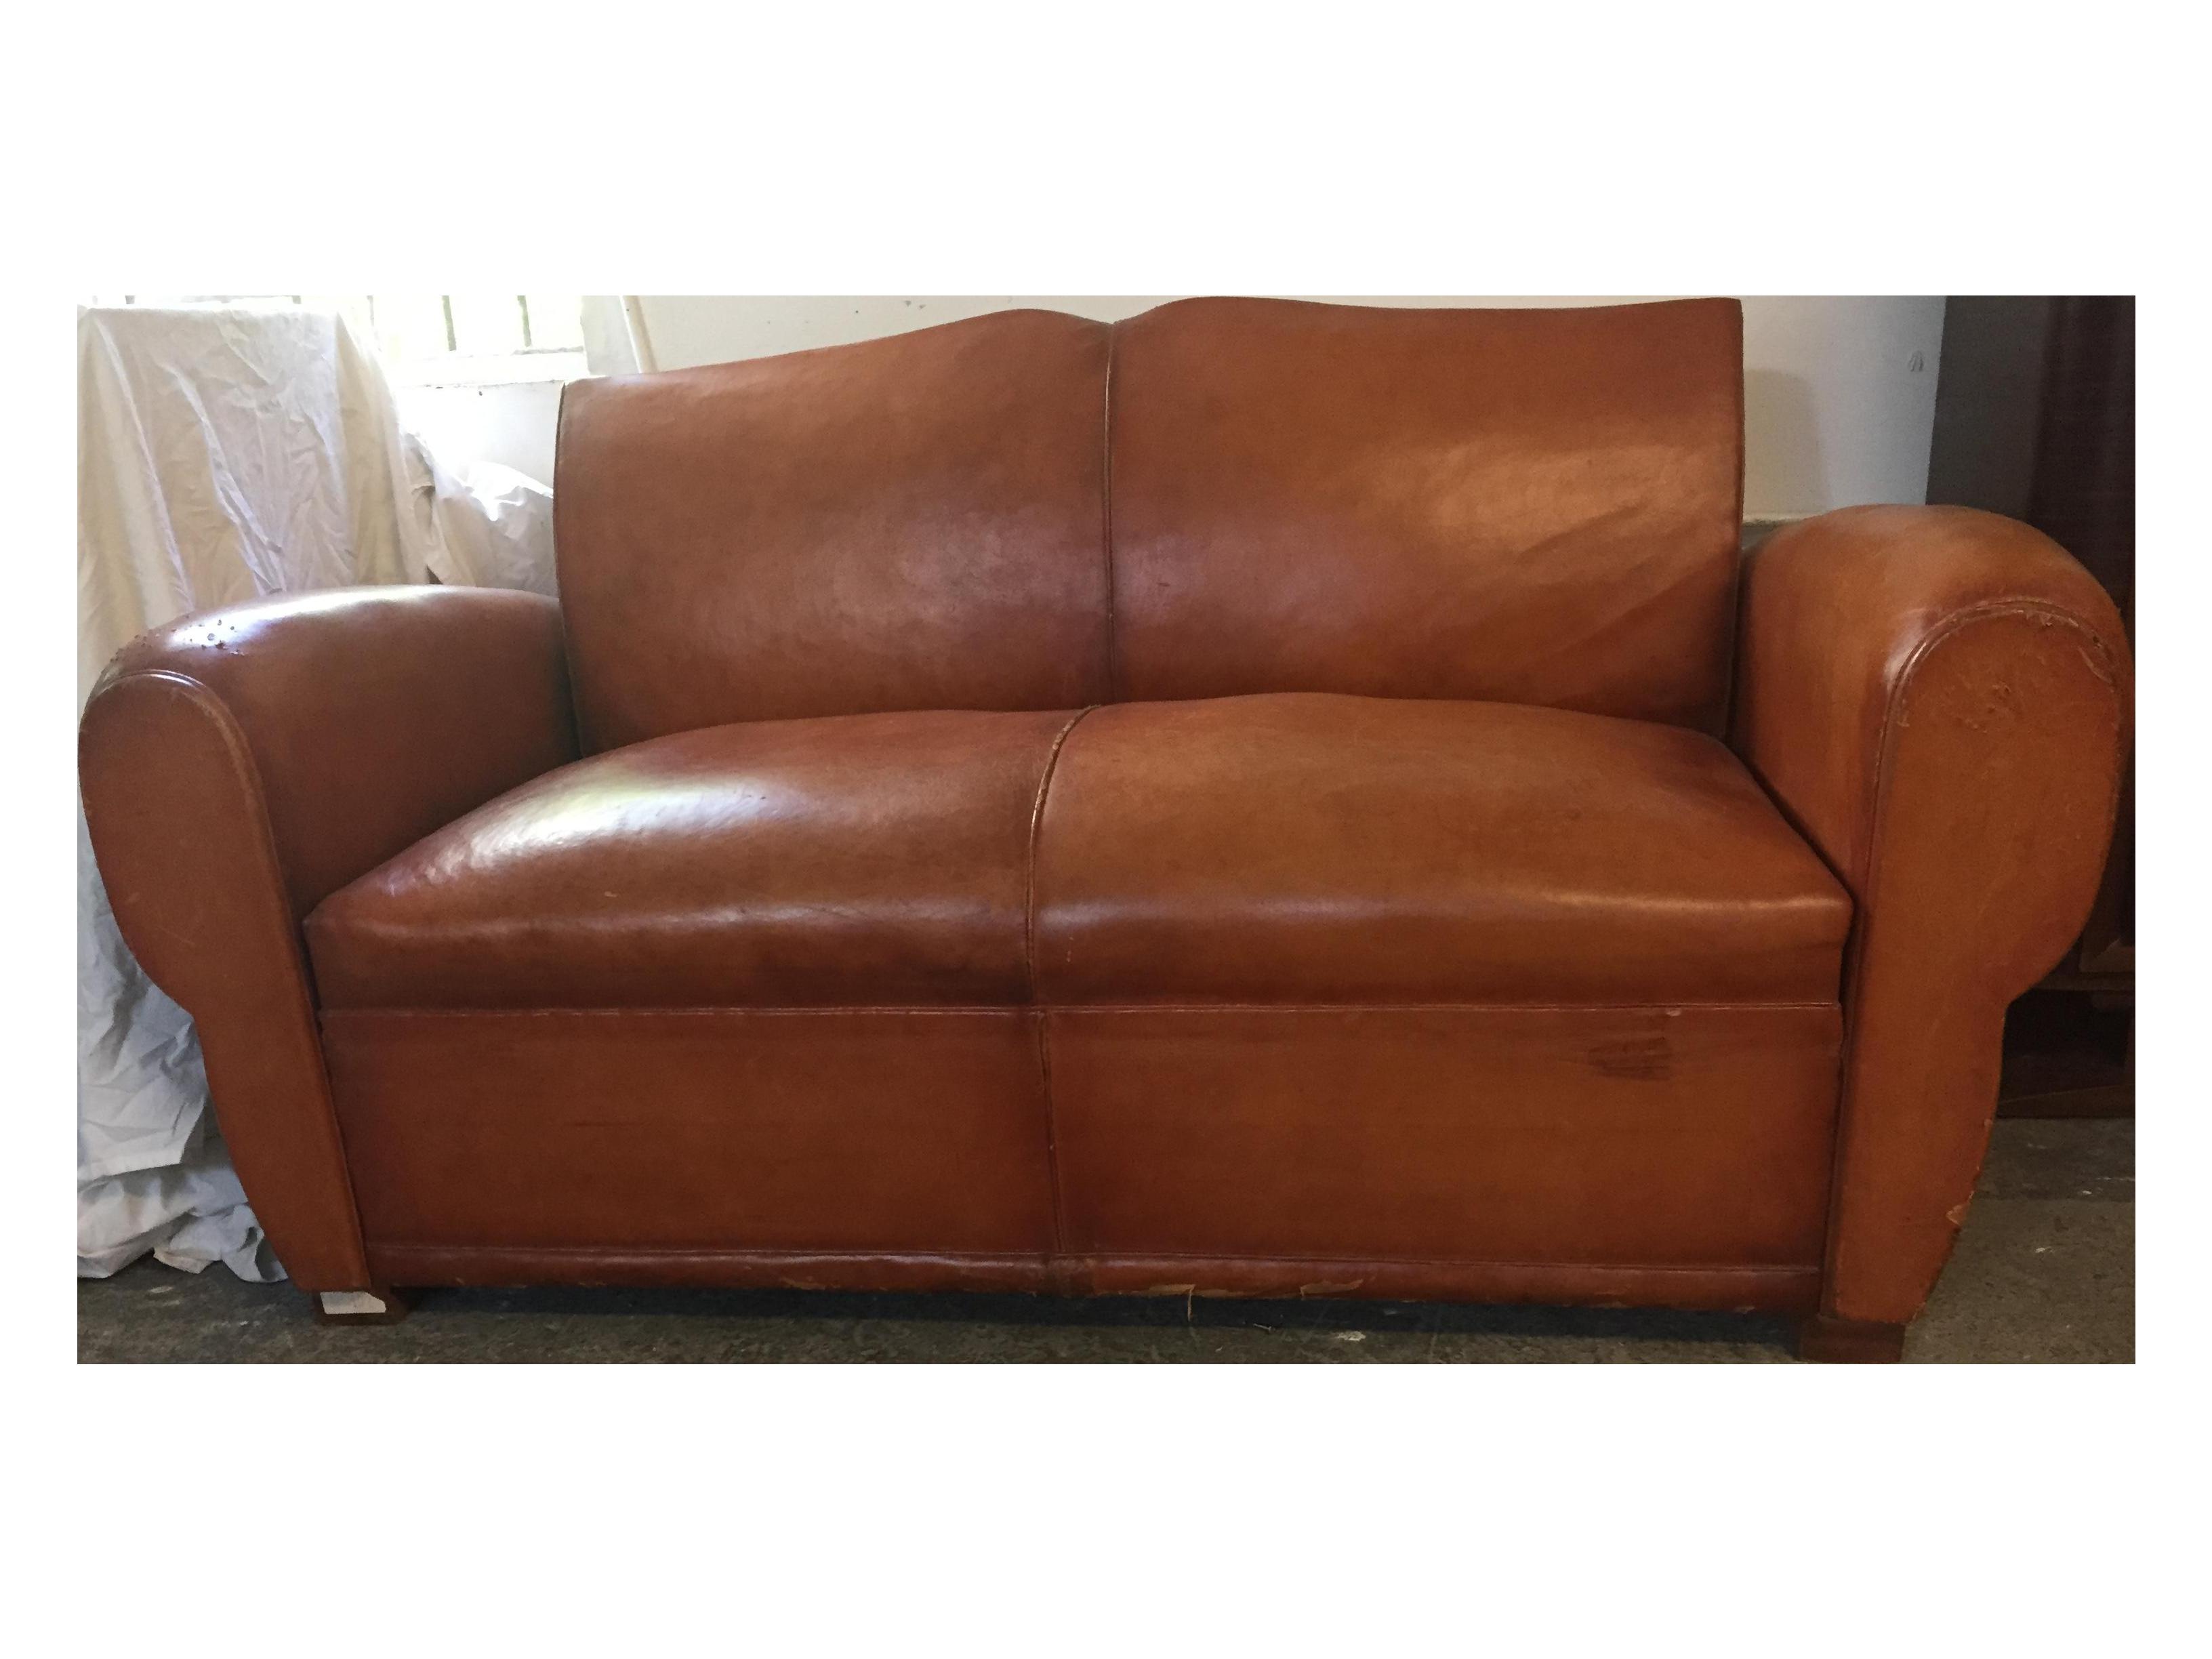 1940s Vintage Brown Leather Sleeper Sofa Chairish